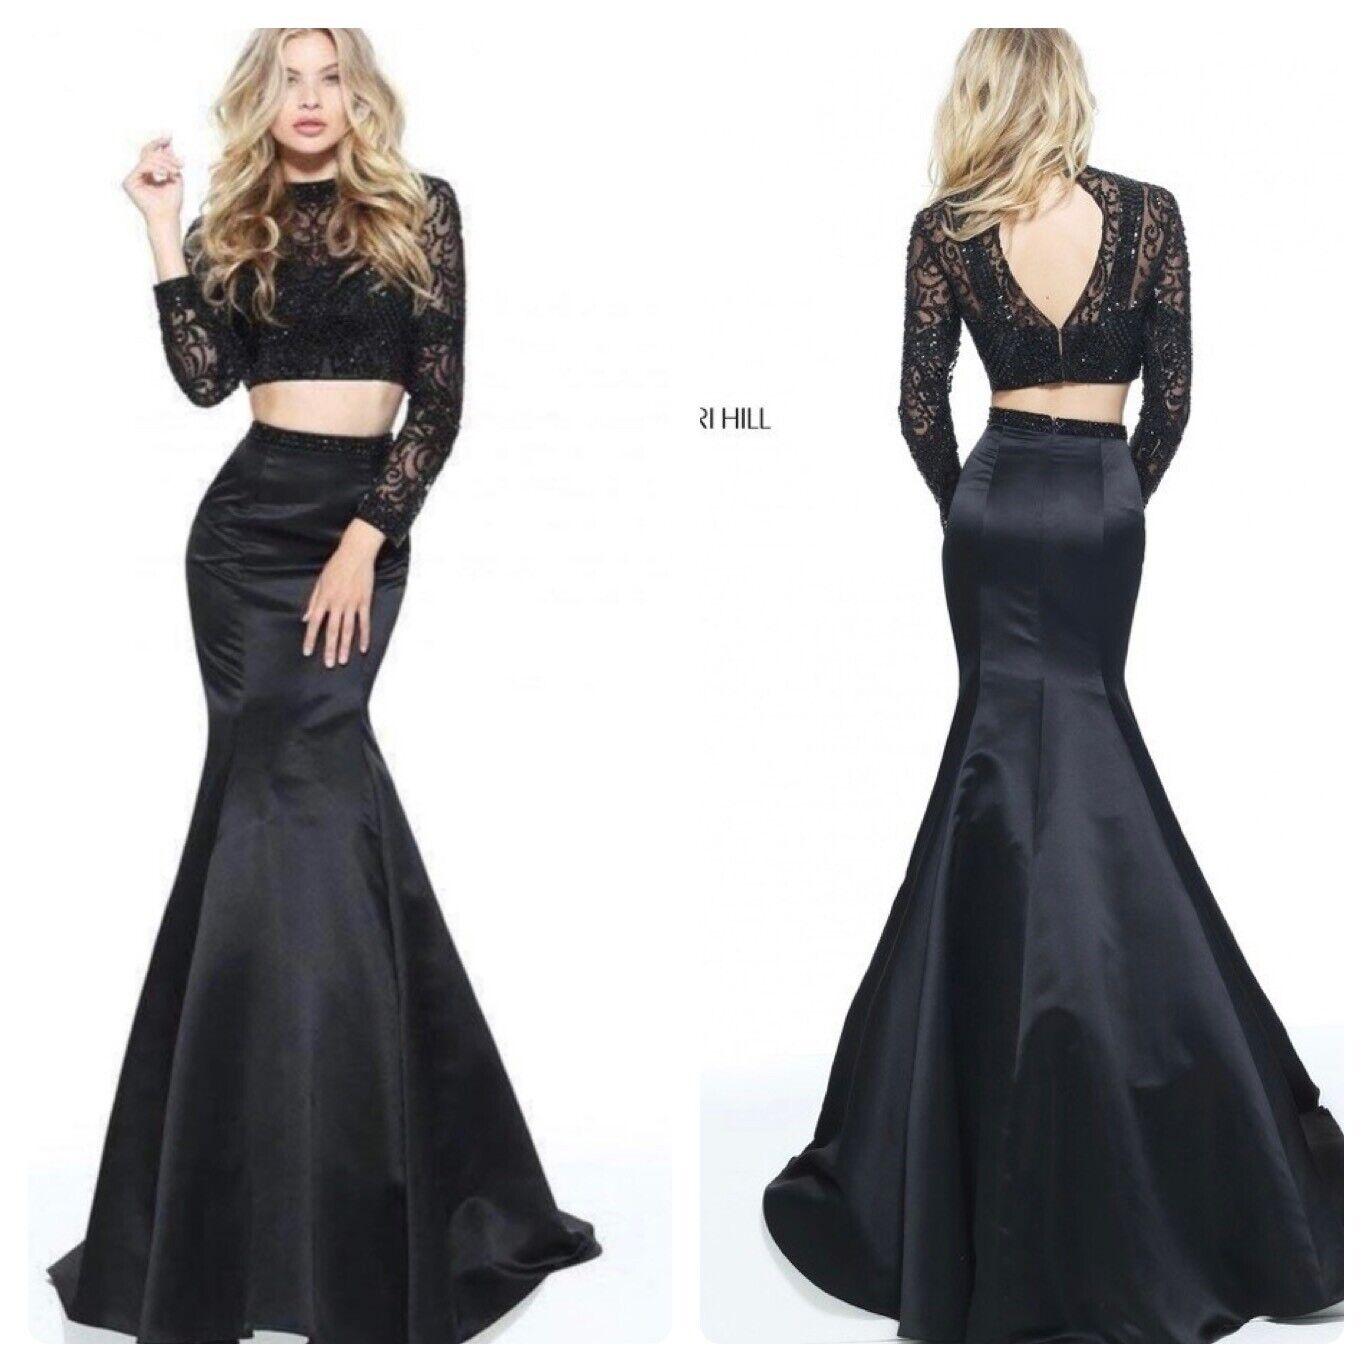 Sherri Hill Women's Black 51107 Beaded Top & Satin Skirt 2-Piece Size 2